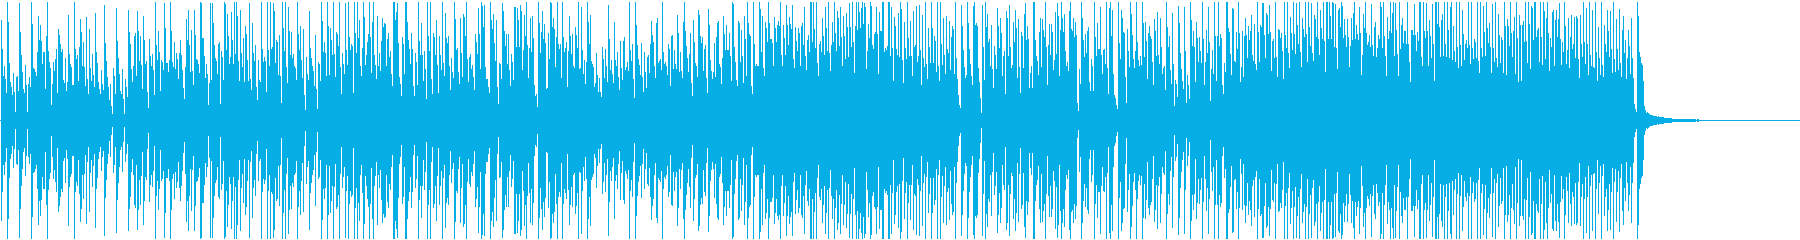 CMや映像におしゃれなジャズピアノロックの再生済みの波形